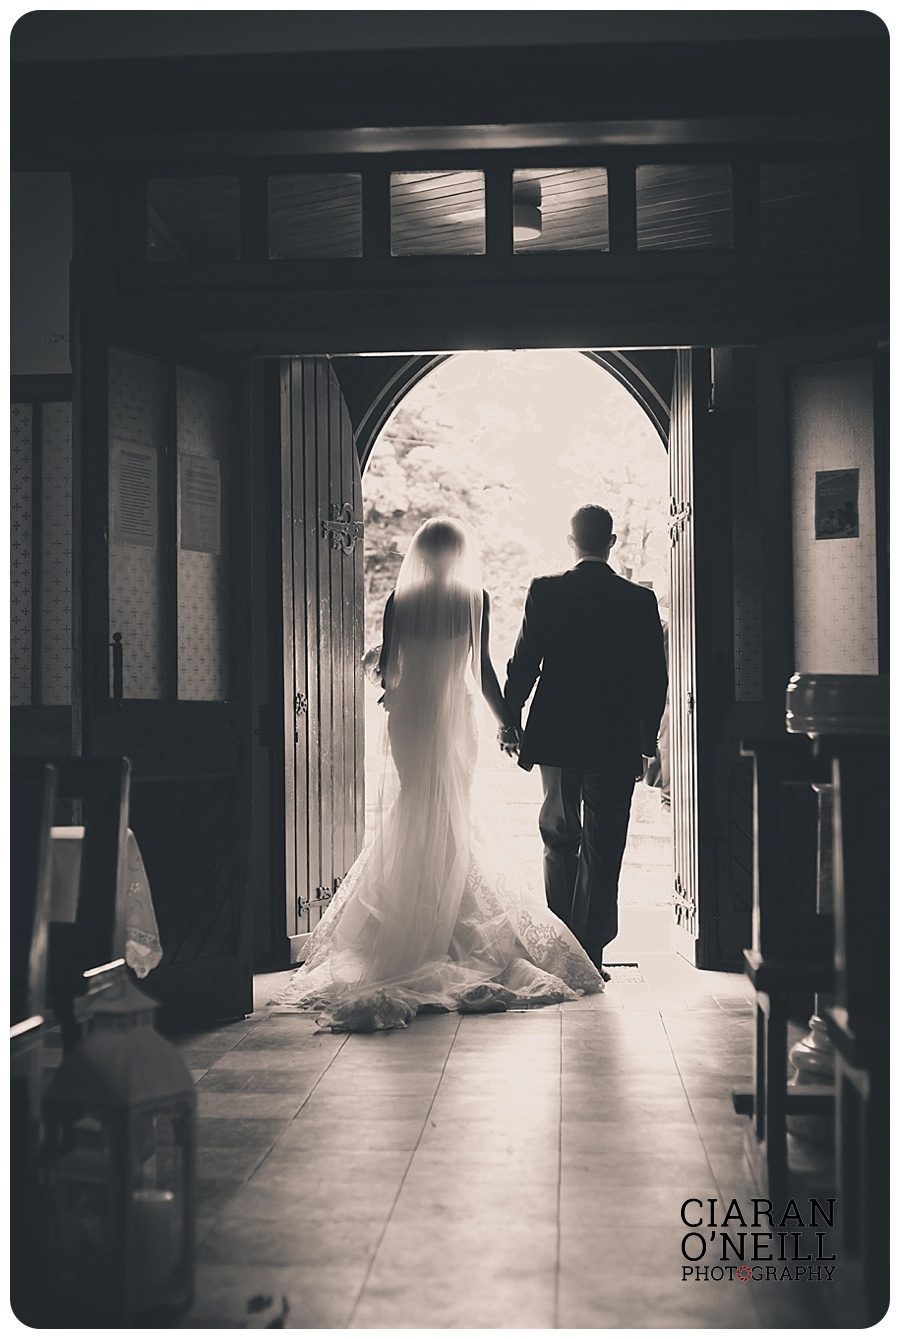 Kelly & Aodhan's wedding at Ballymagarvey Village by Ciaran O'Neill Photography 12